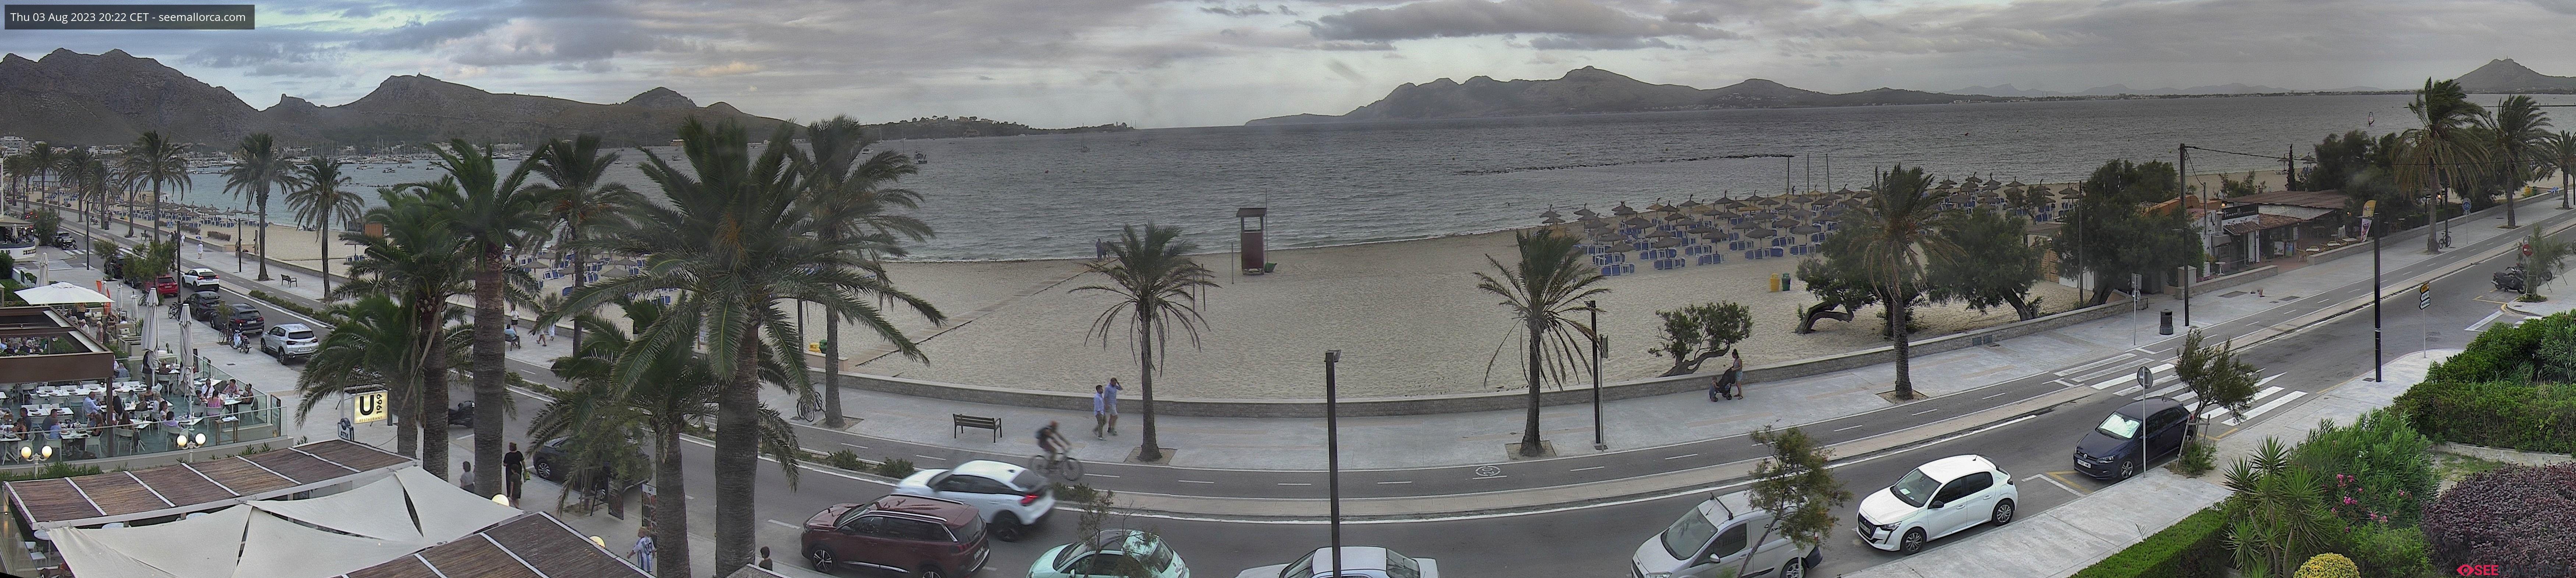 Webkamera Mallorca